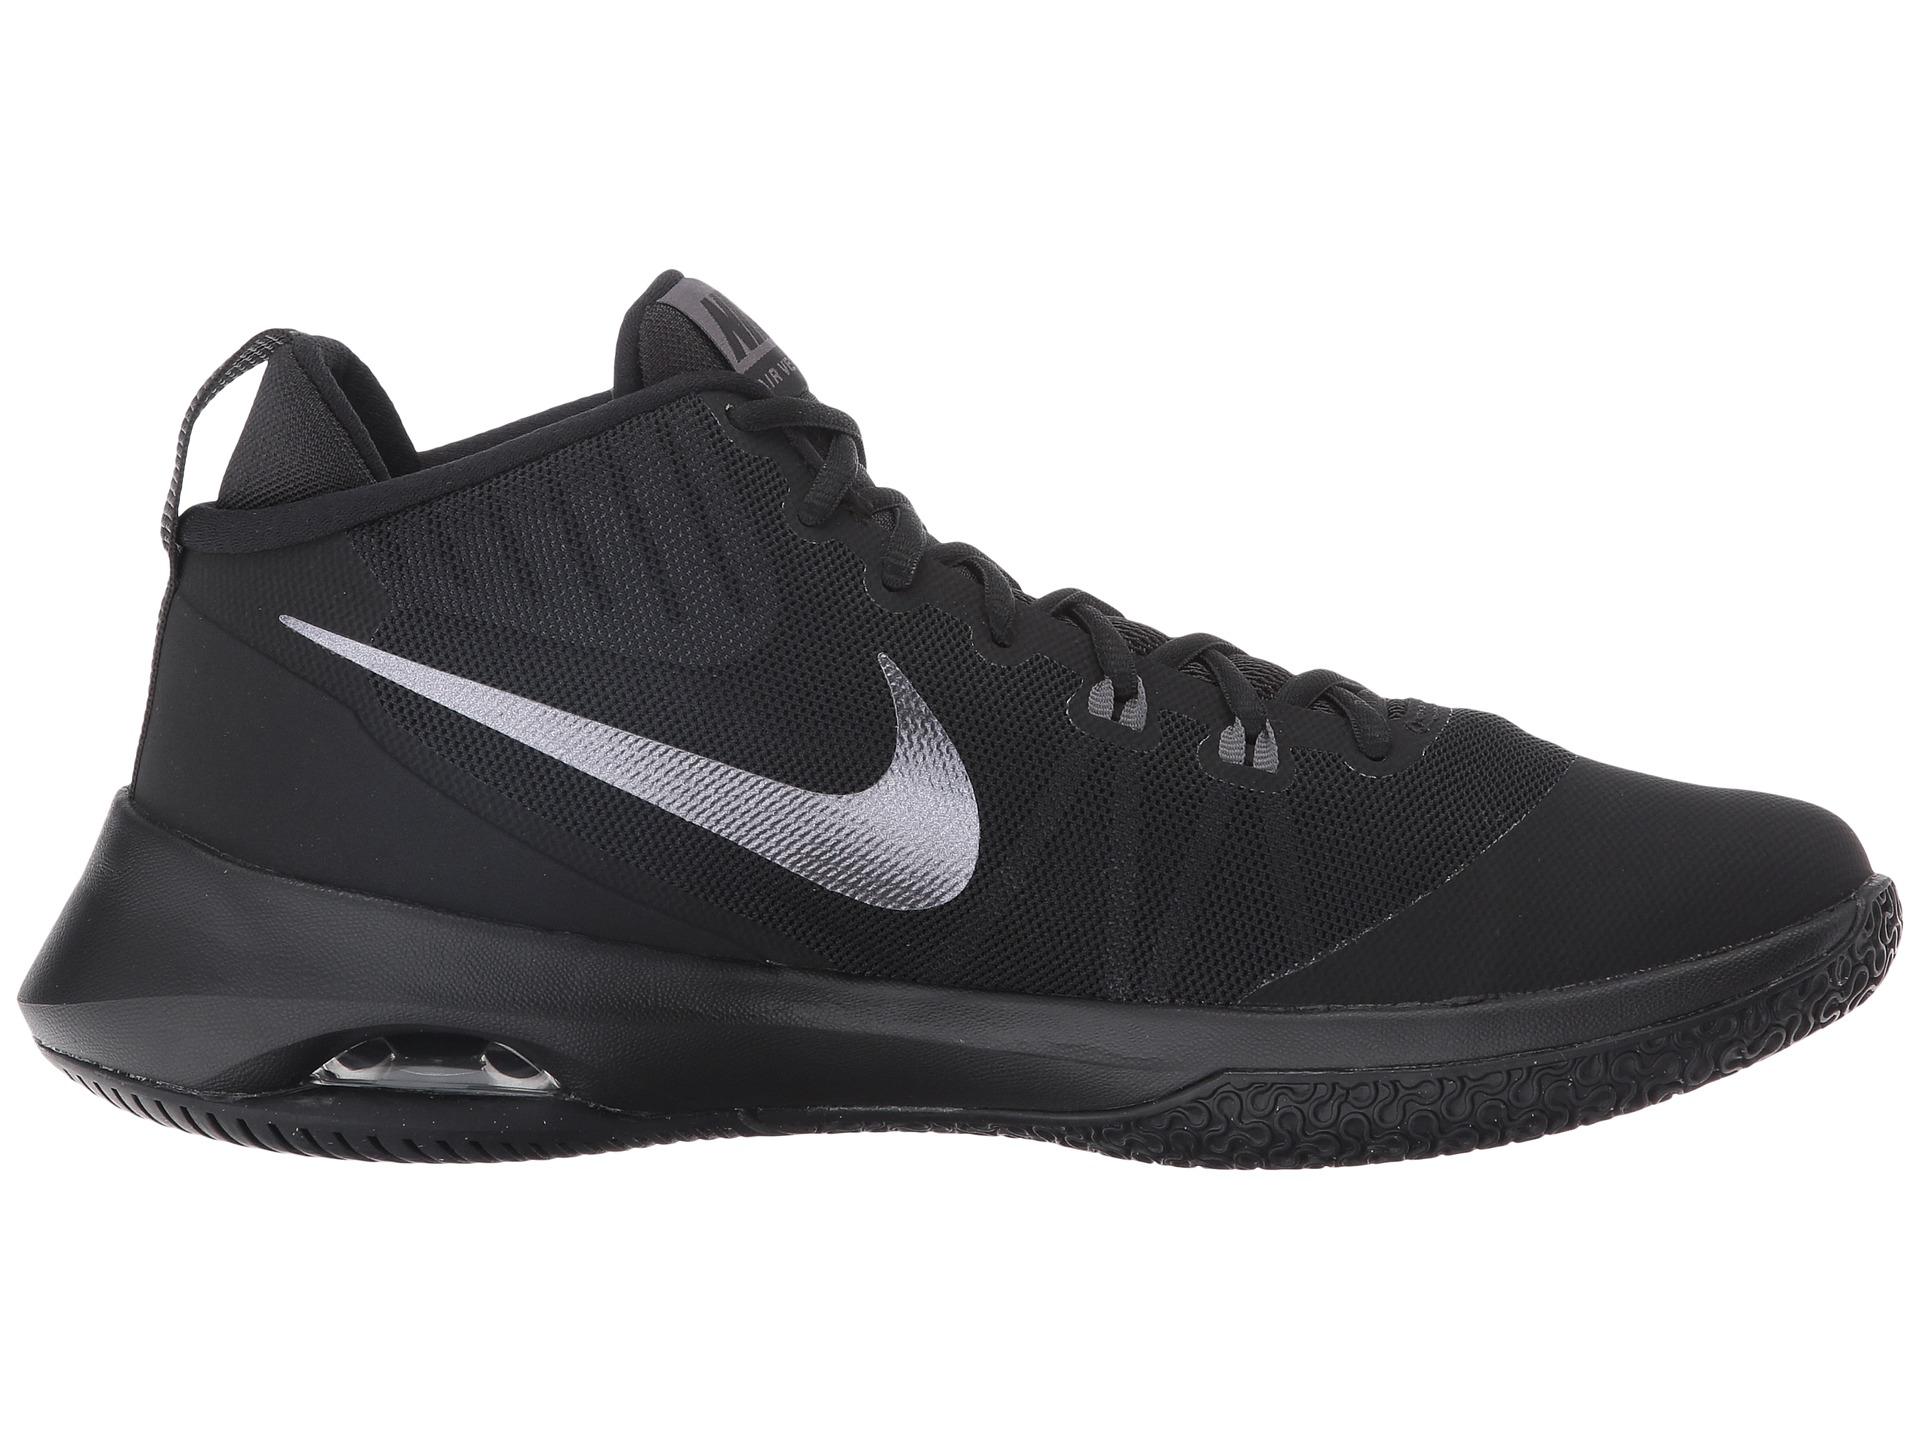 Nike Air Versatile Basketball Shoes